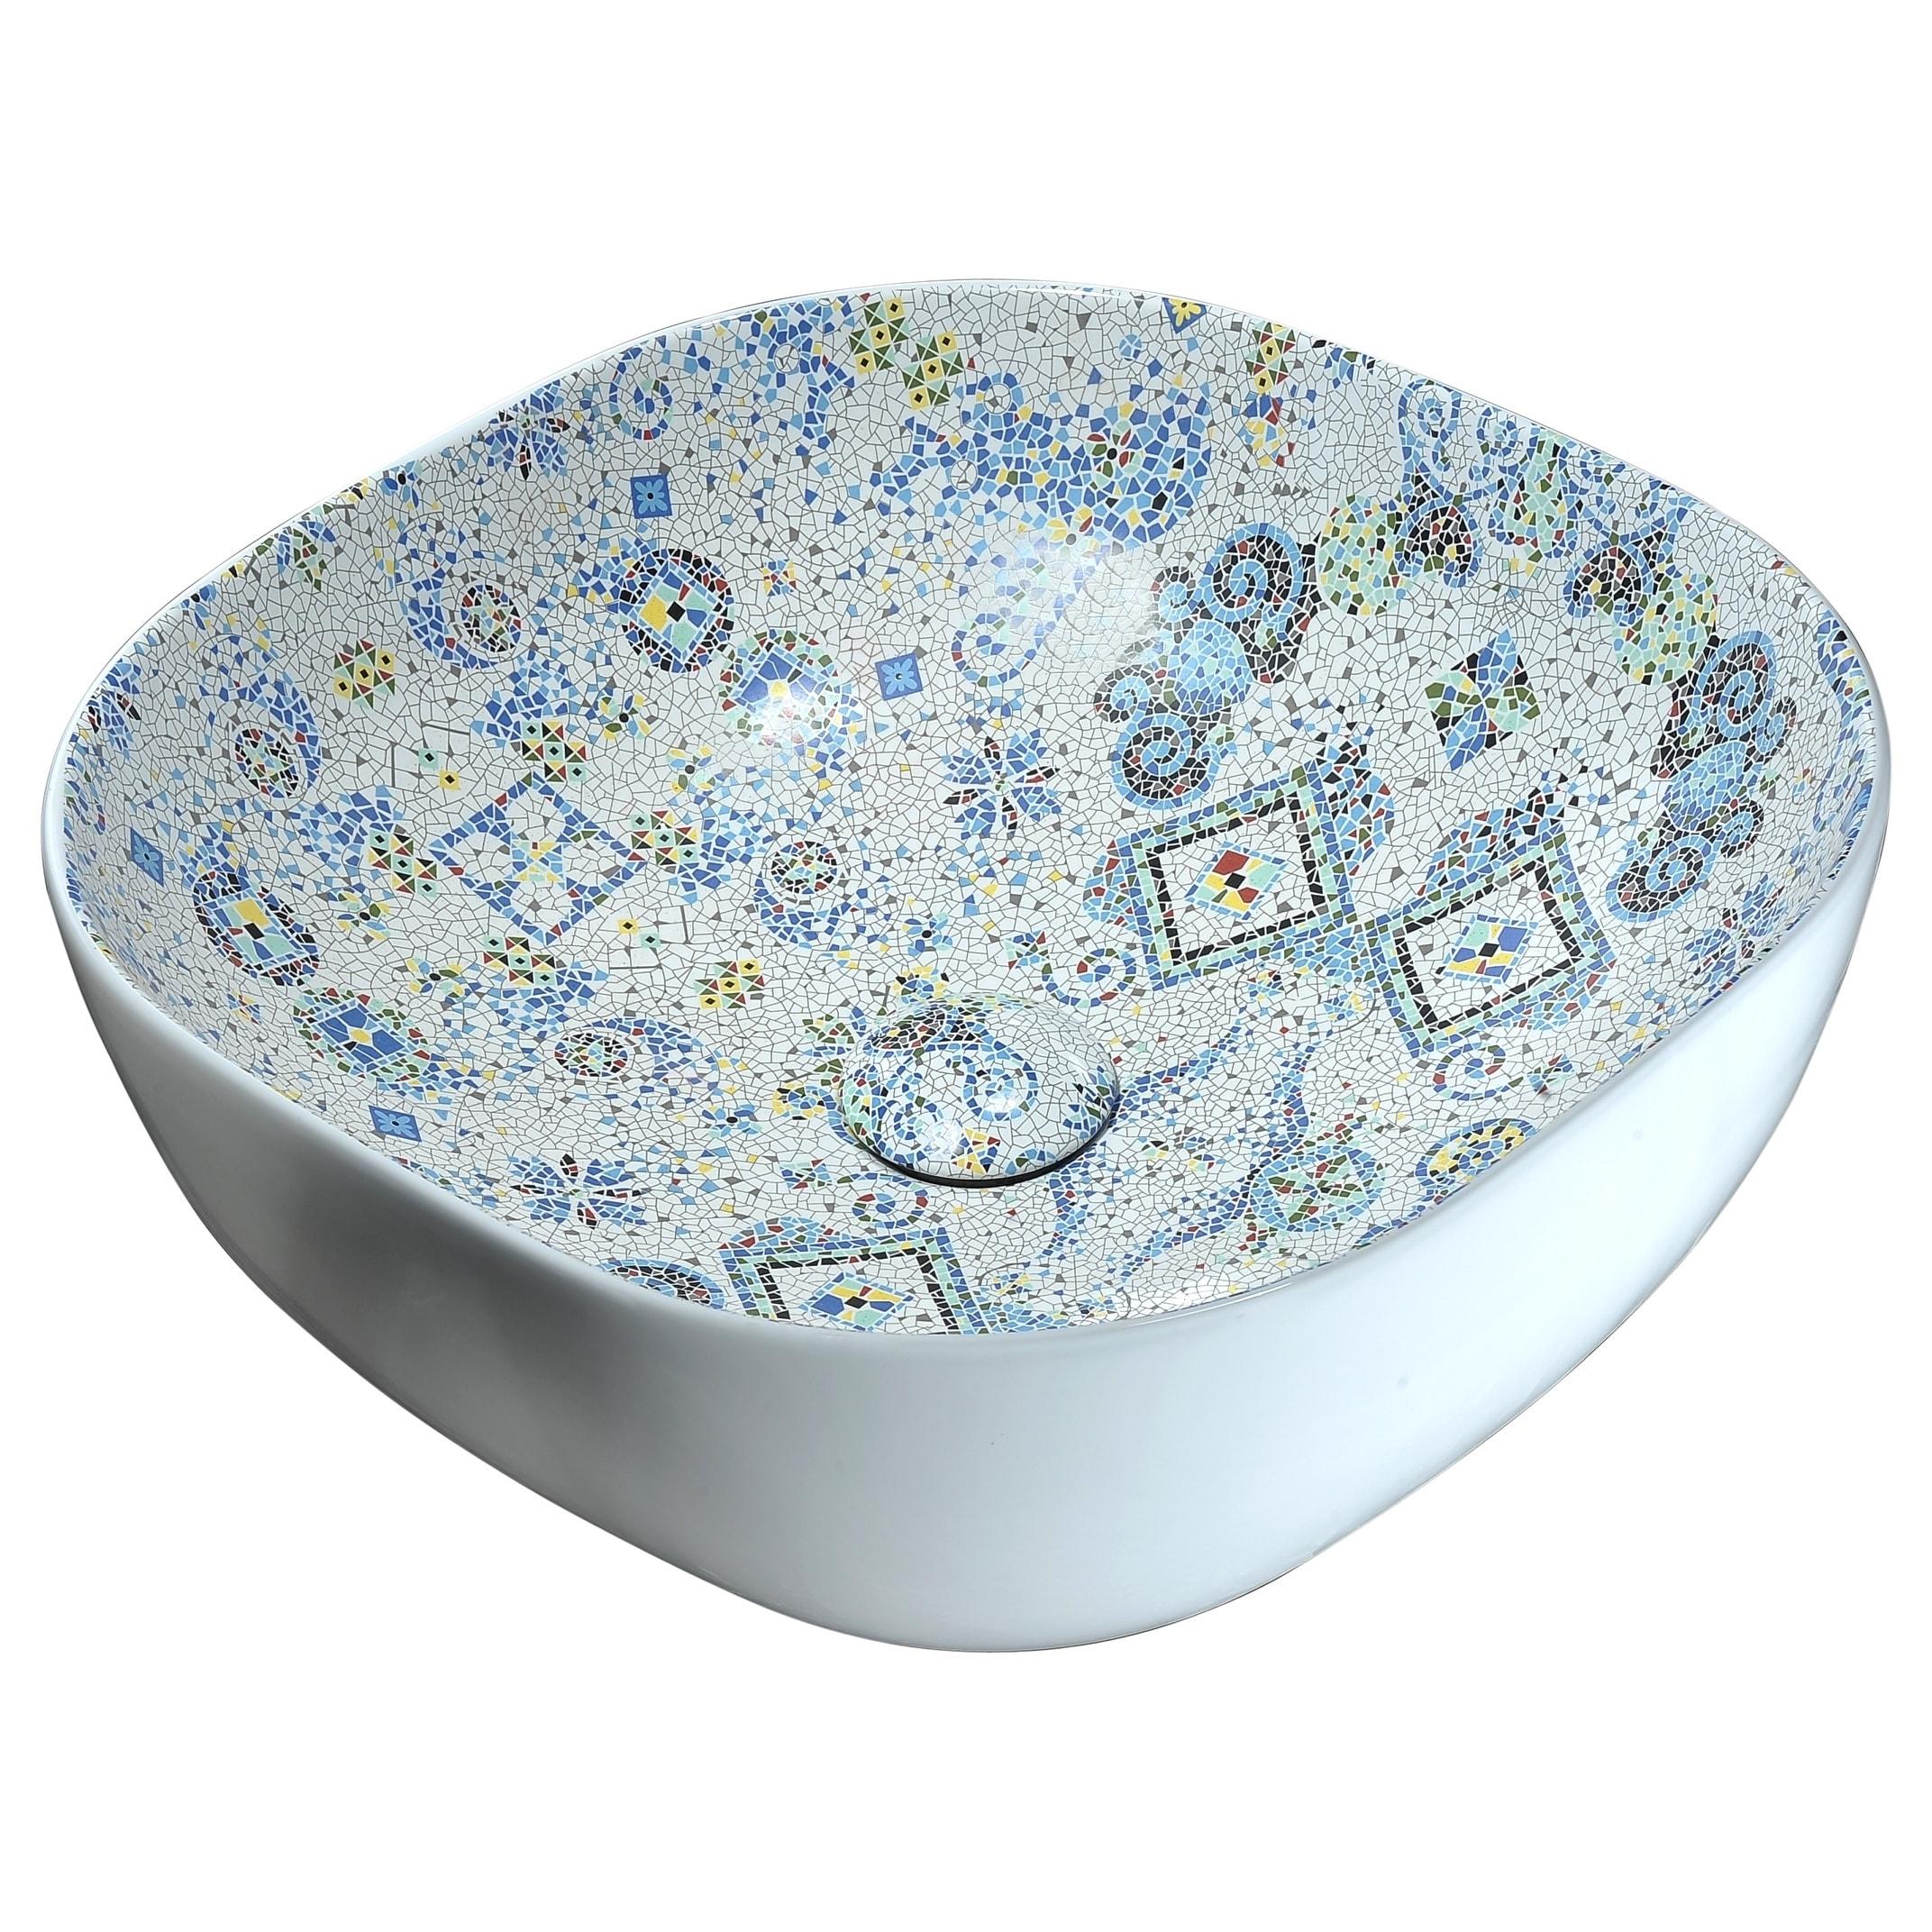 Anzzi Byzantian Series Mosaic Finish Ceramic Vessel Sink | eBay